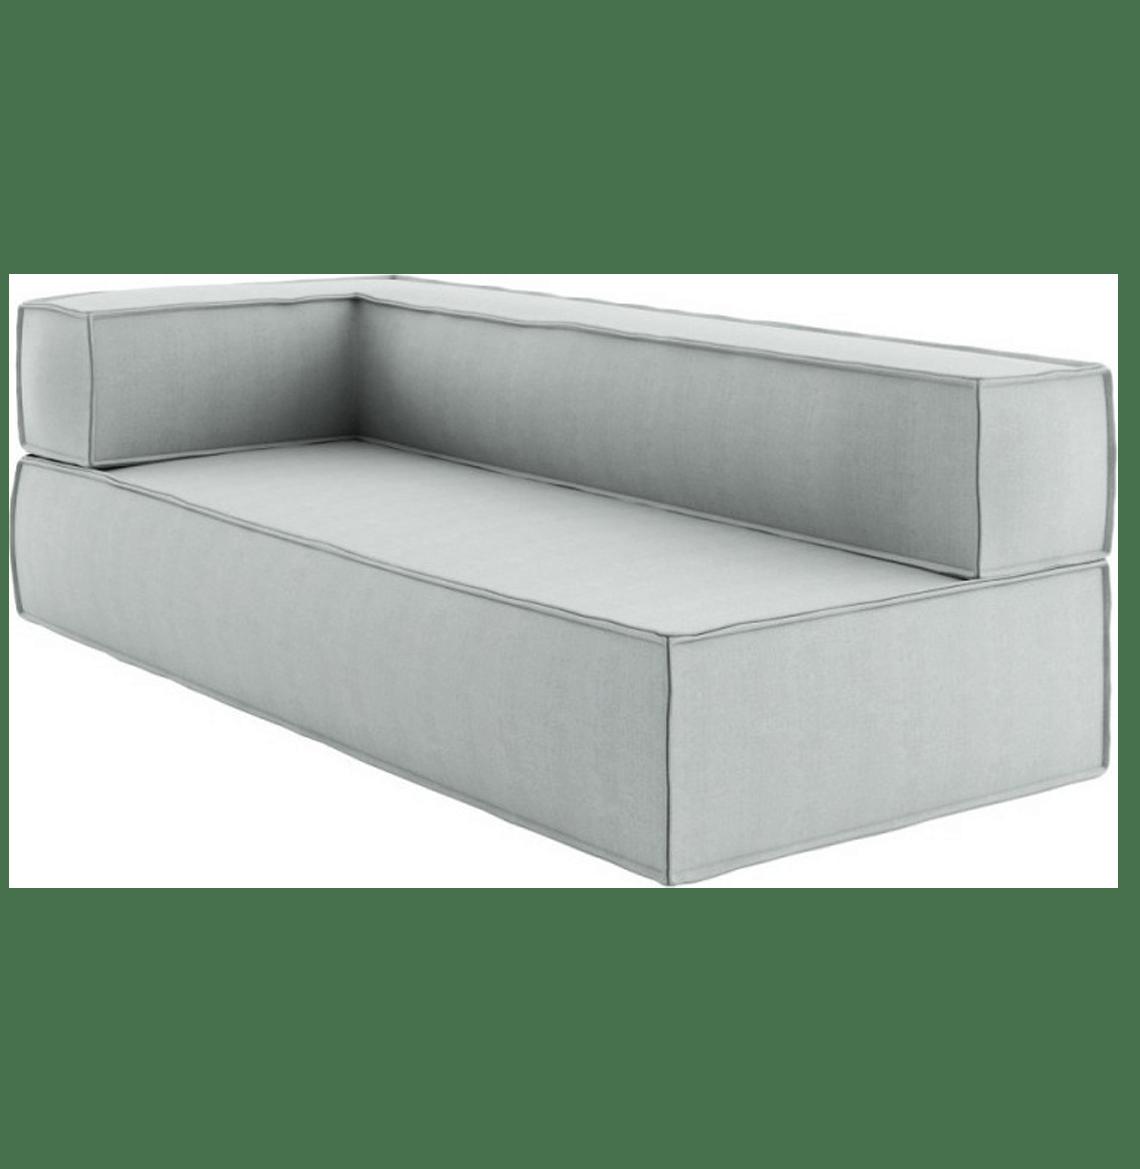 Sezlong 200×200 Basic Stang – Colectia NOI